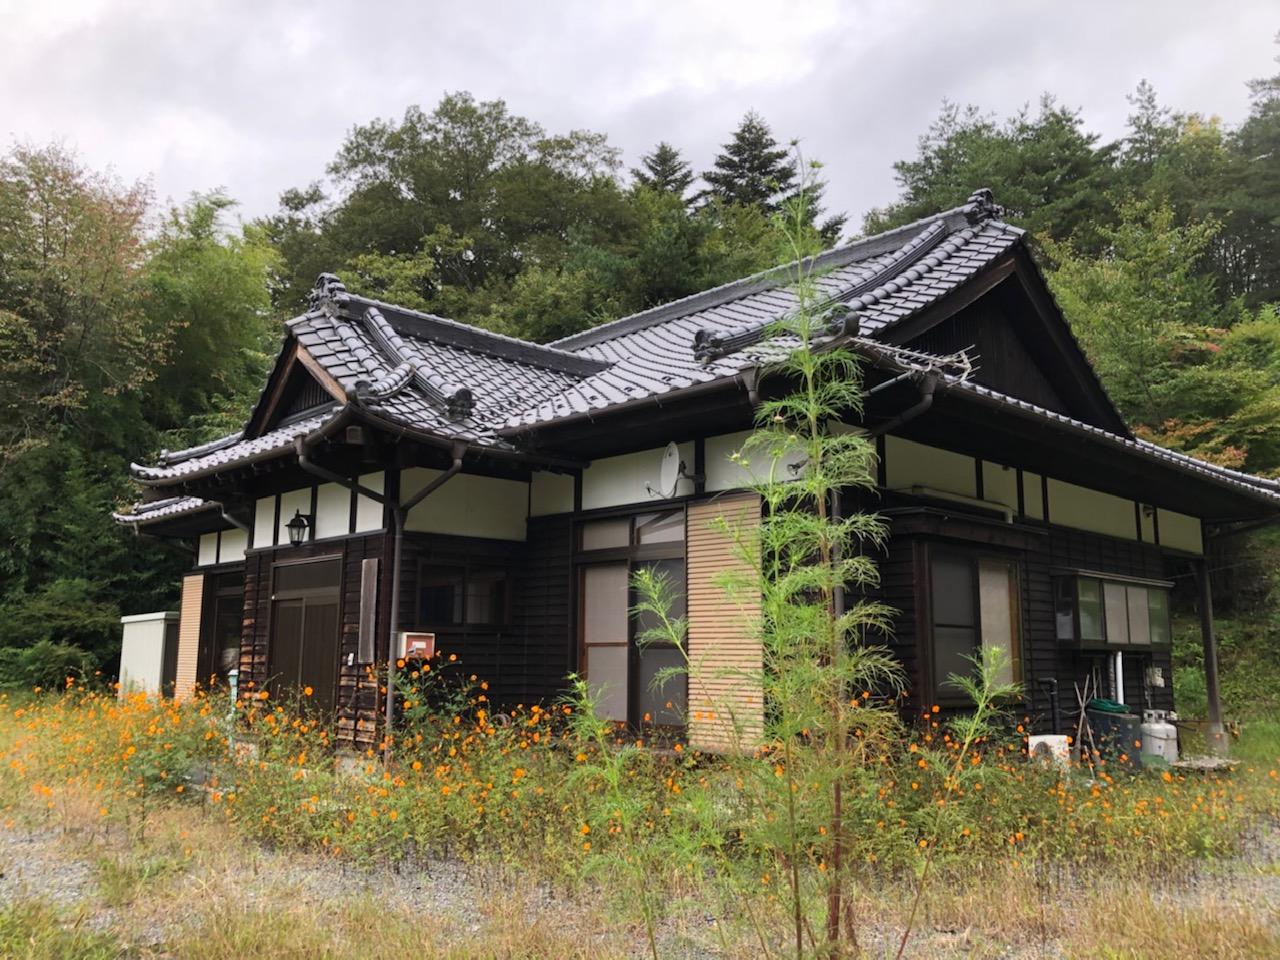 【HIKORONOSATO】Private Lodging at Satoyama in Minamisanriku-cho